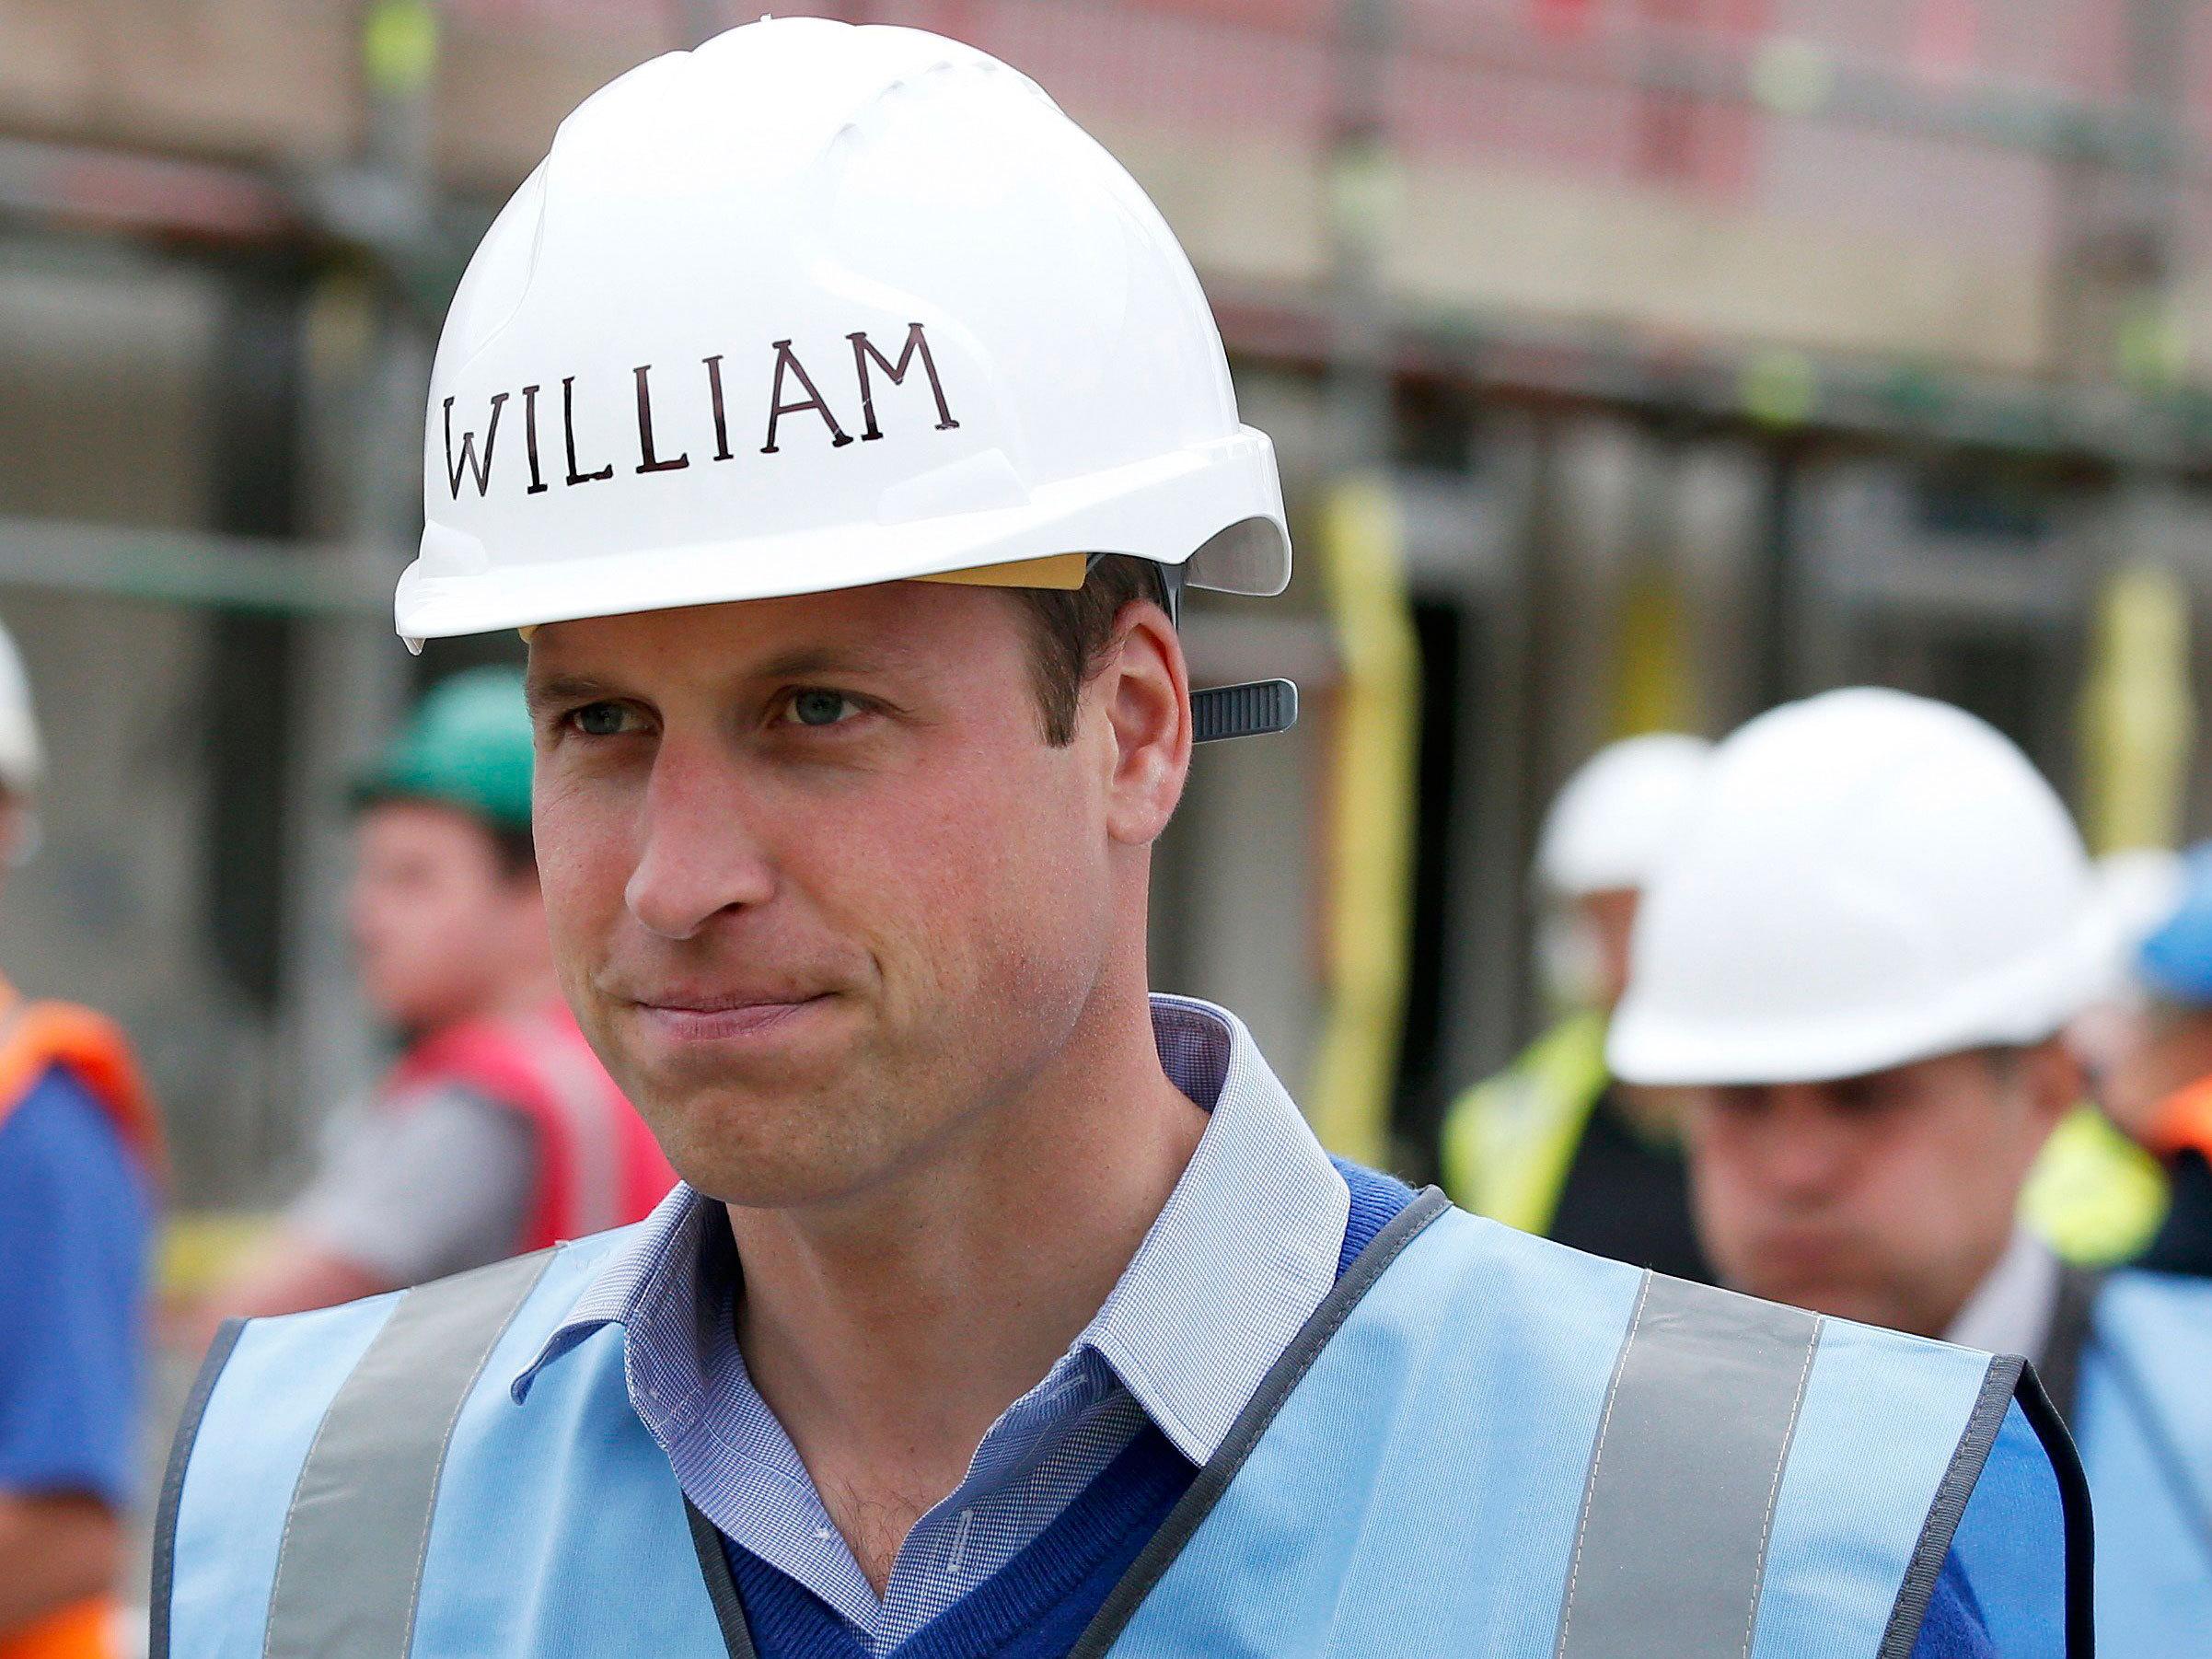 Prince William Hd